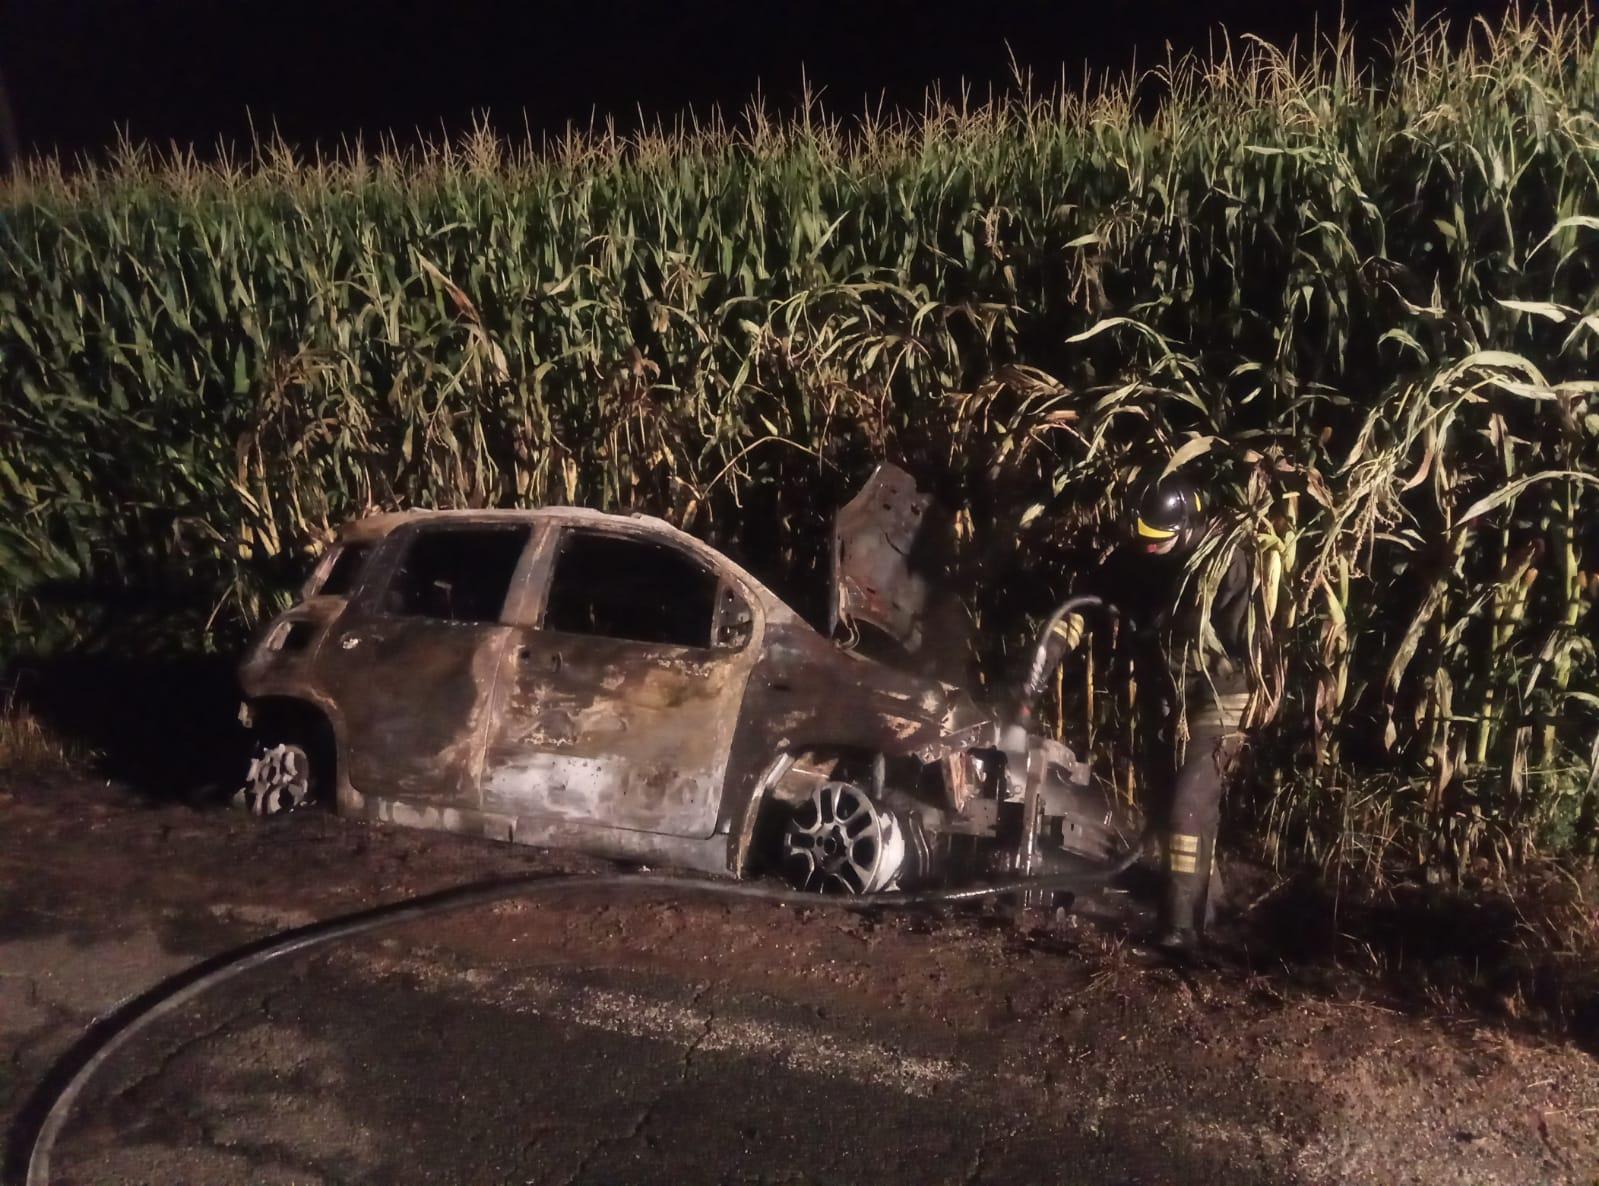 CARMAGNOLA – Auto rubata in fiamme: indagano i carabinieri